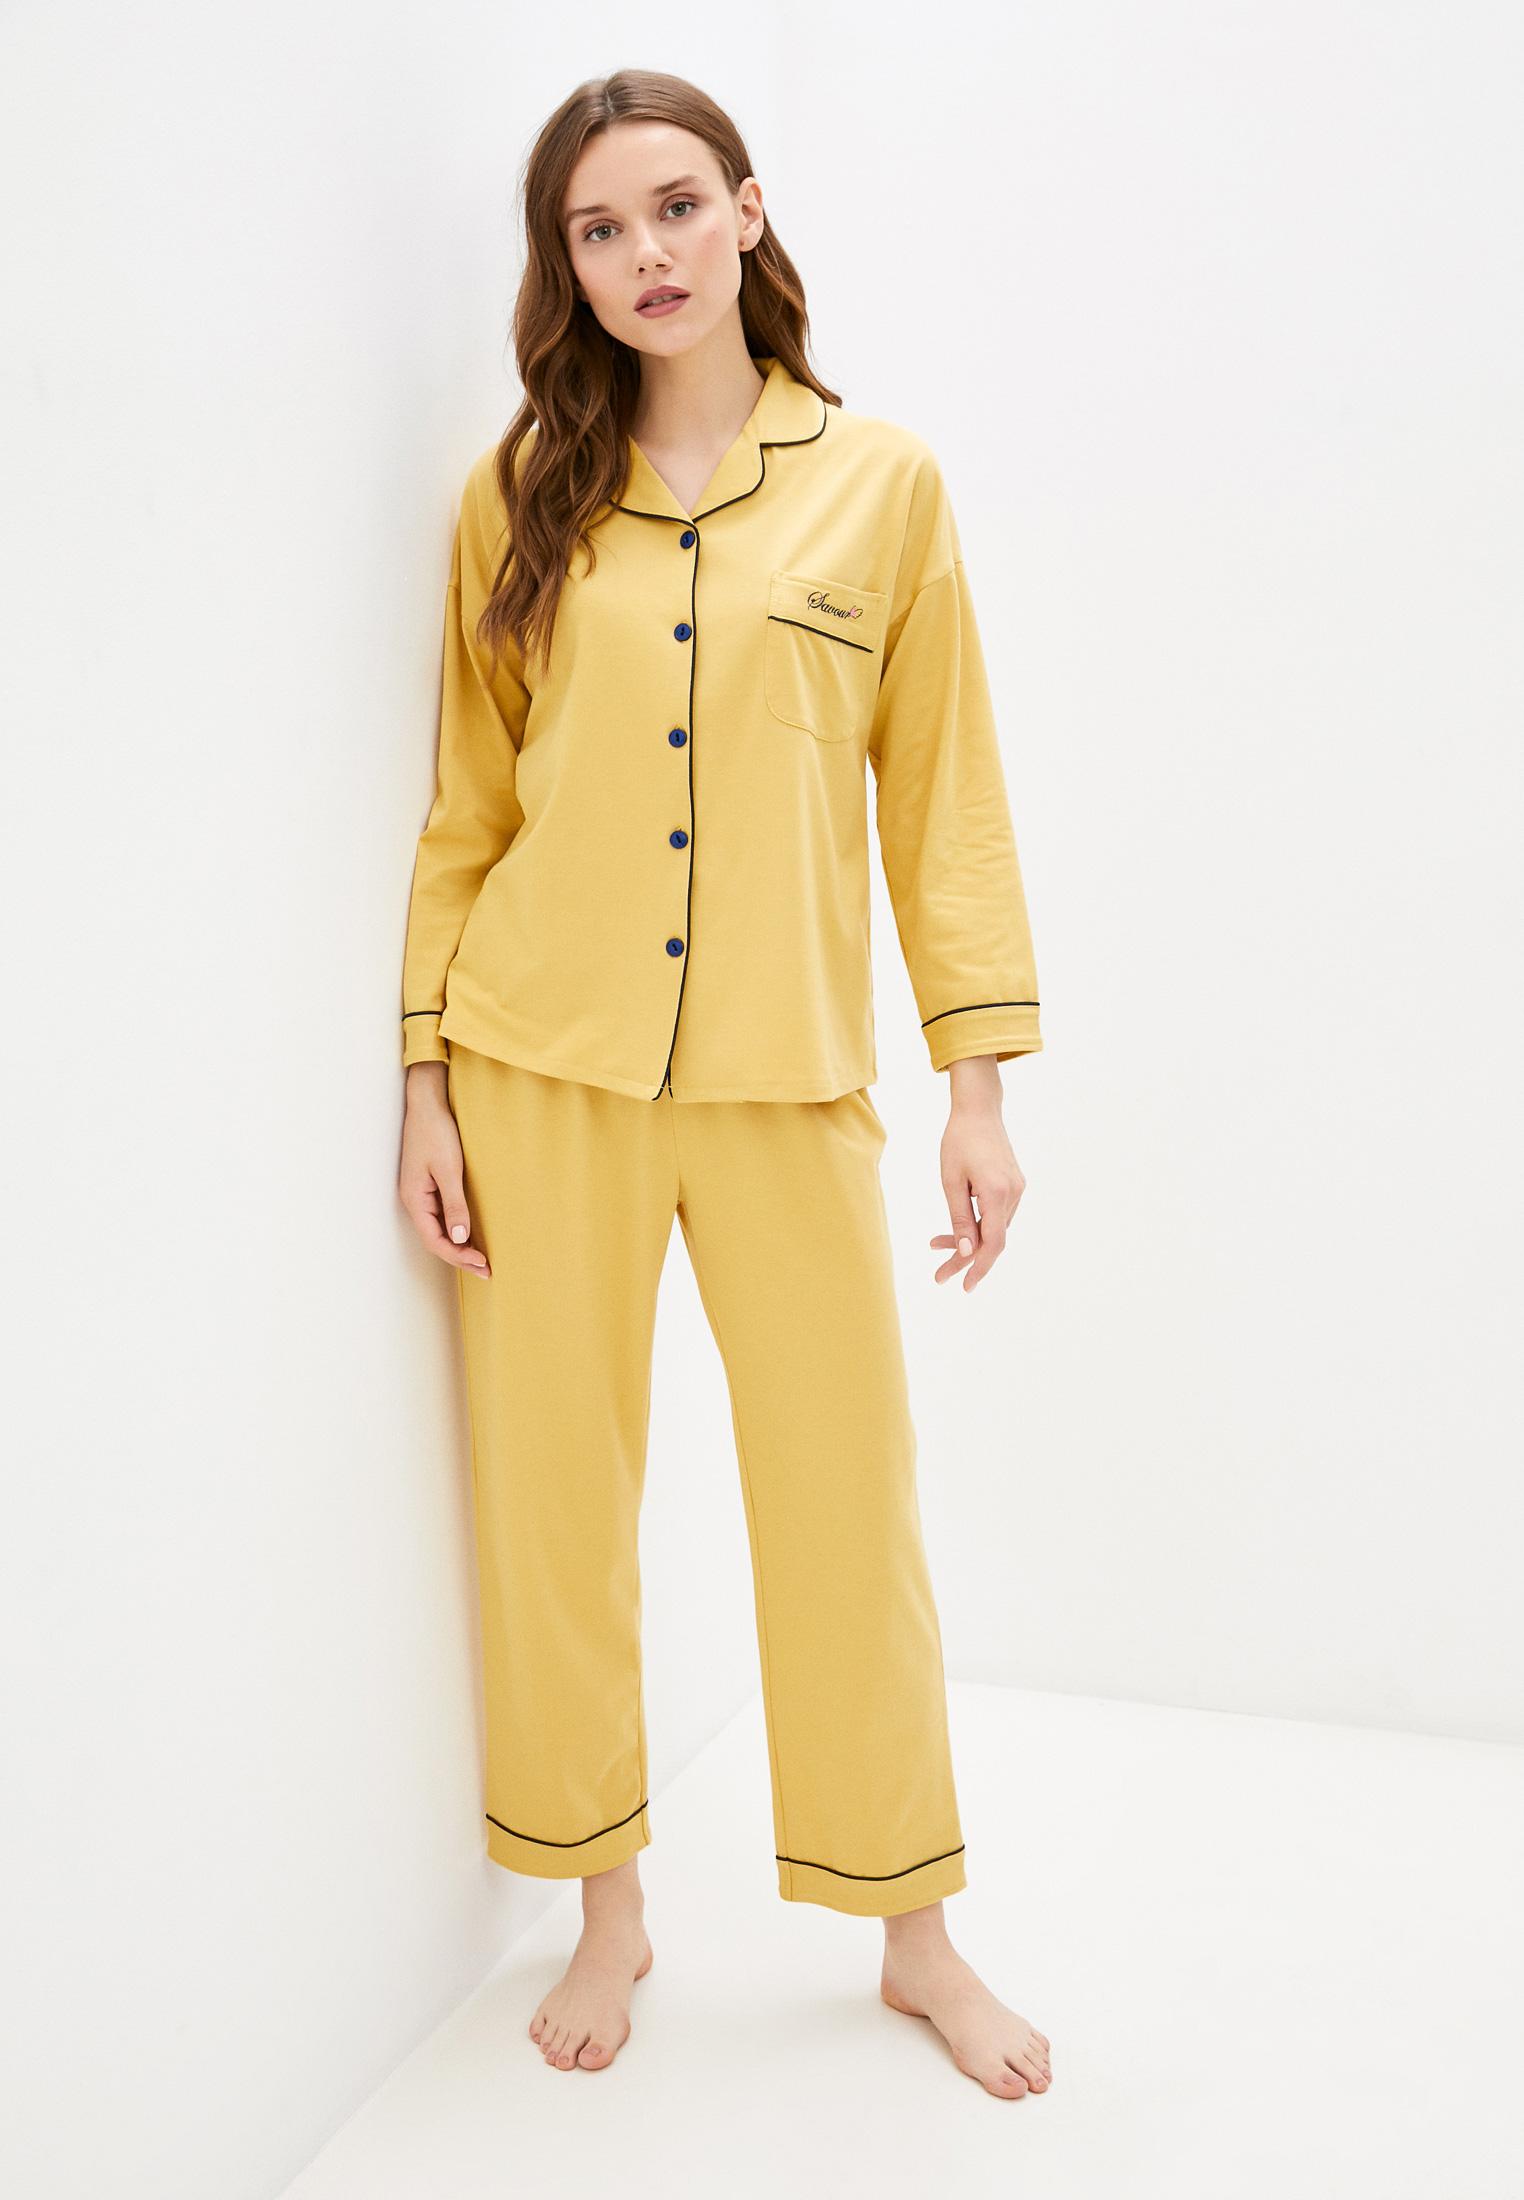 Пижама UnicoModa Пижама UnicoModa